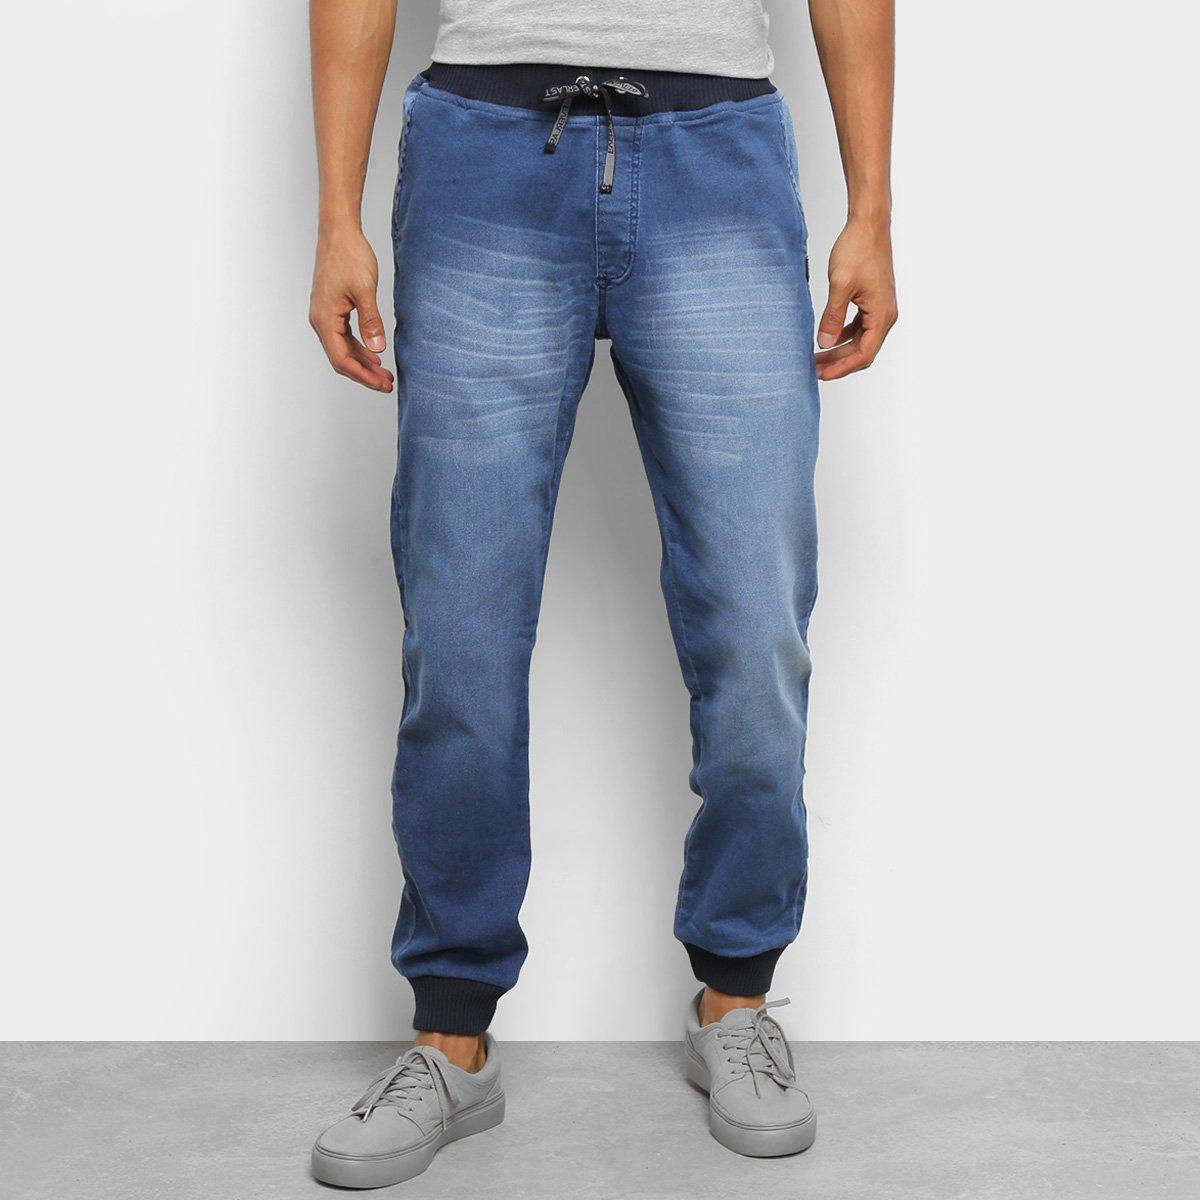 Calça Jeans Everlast Jogger Estonada Masculina